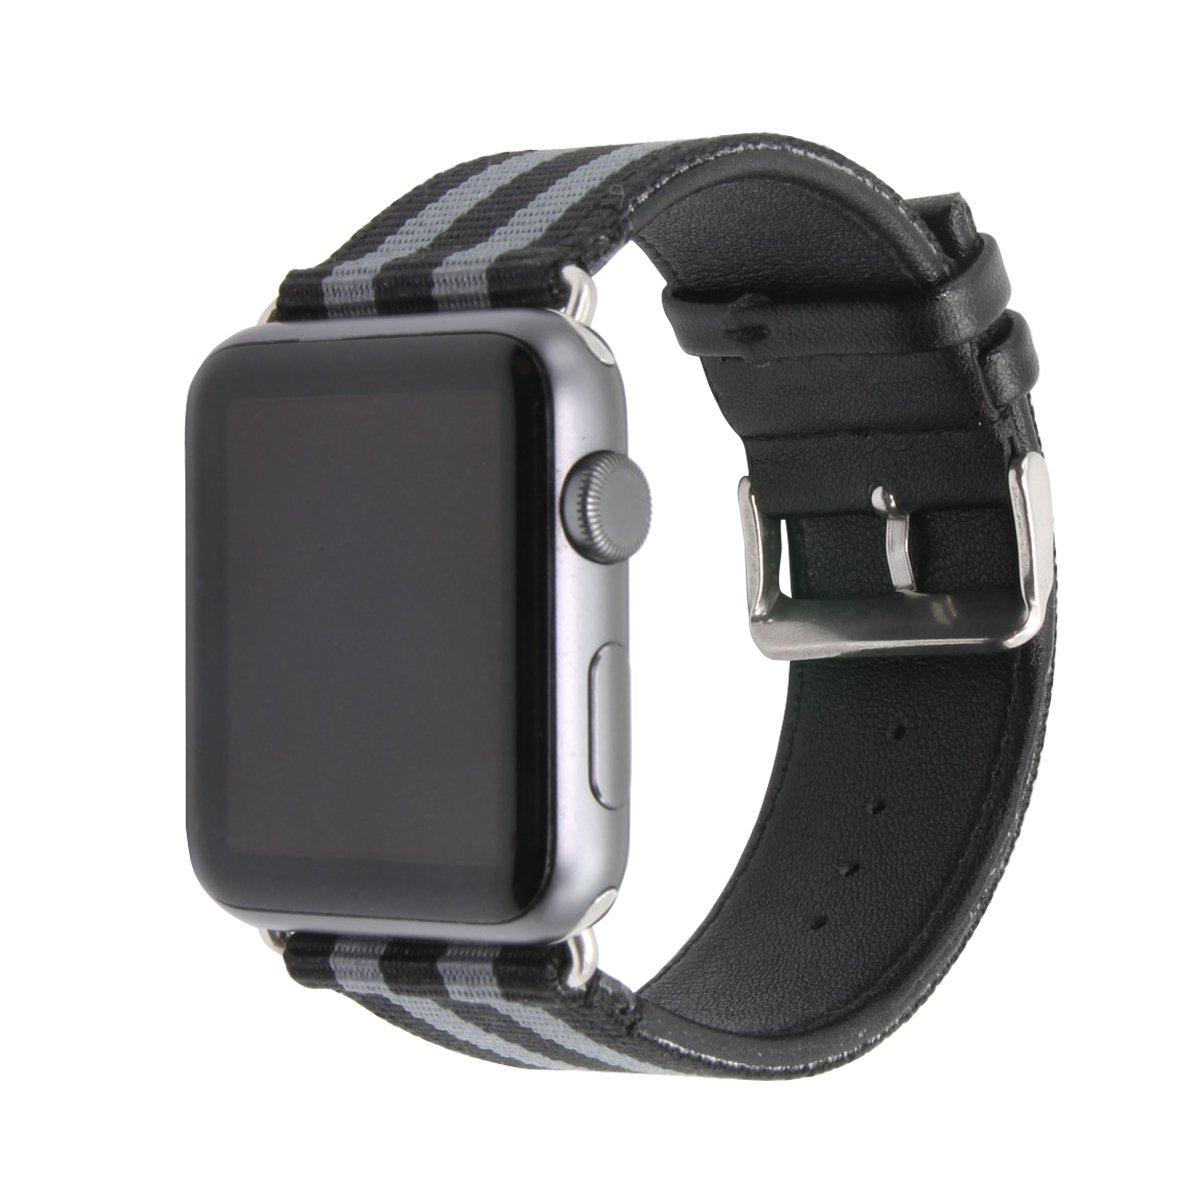 Amazon.com: Zeit Diktator Watch Band for Apple Watch ...